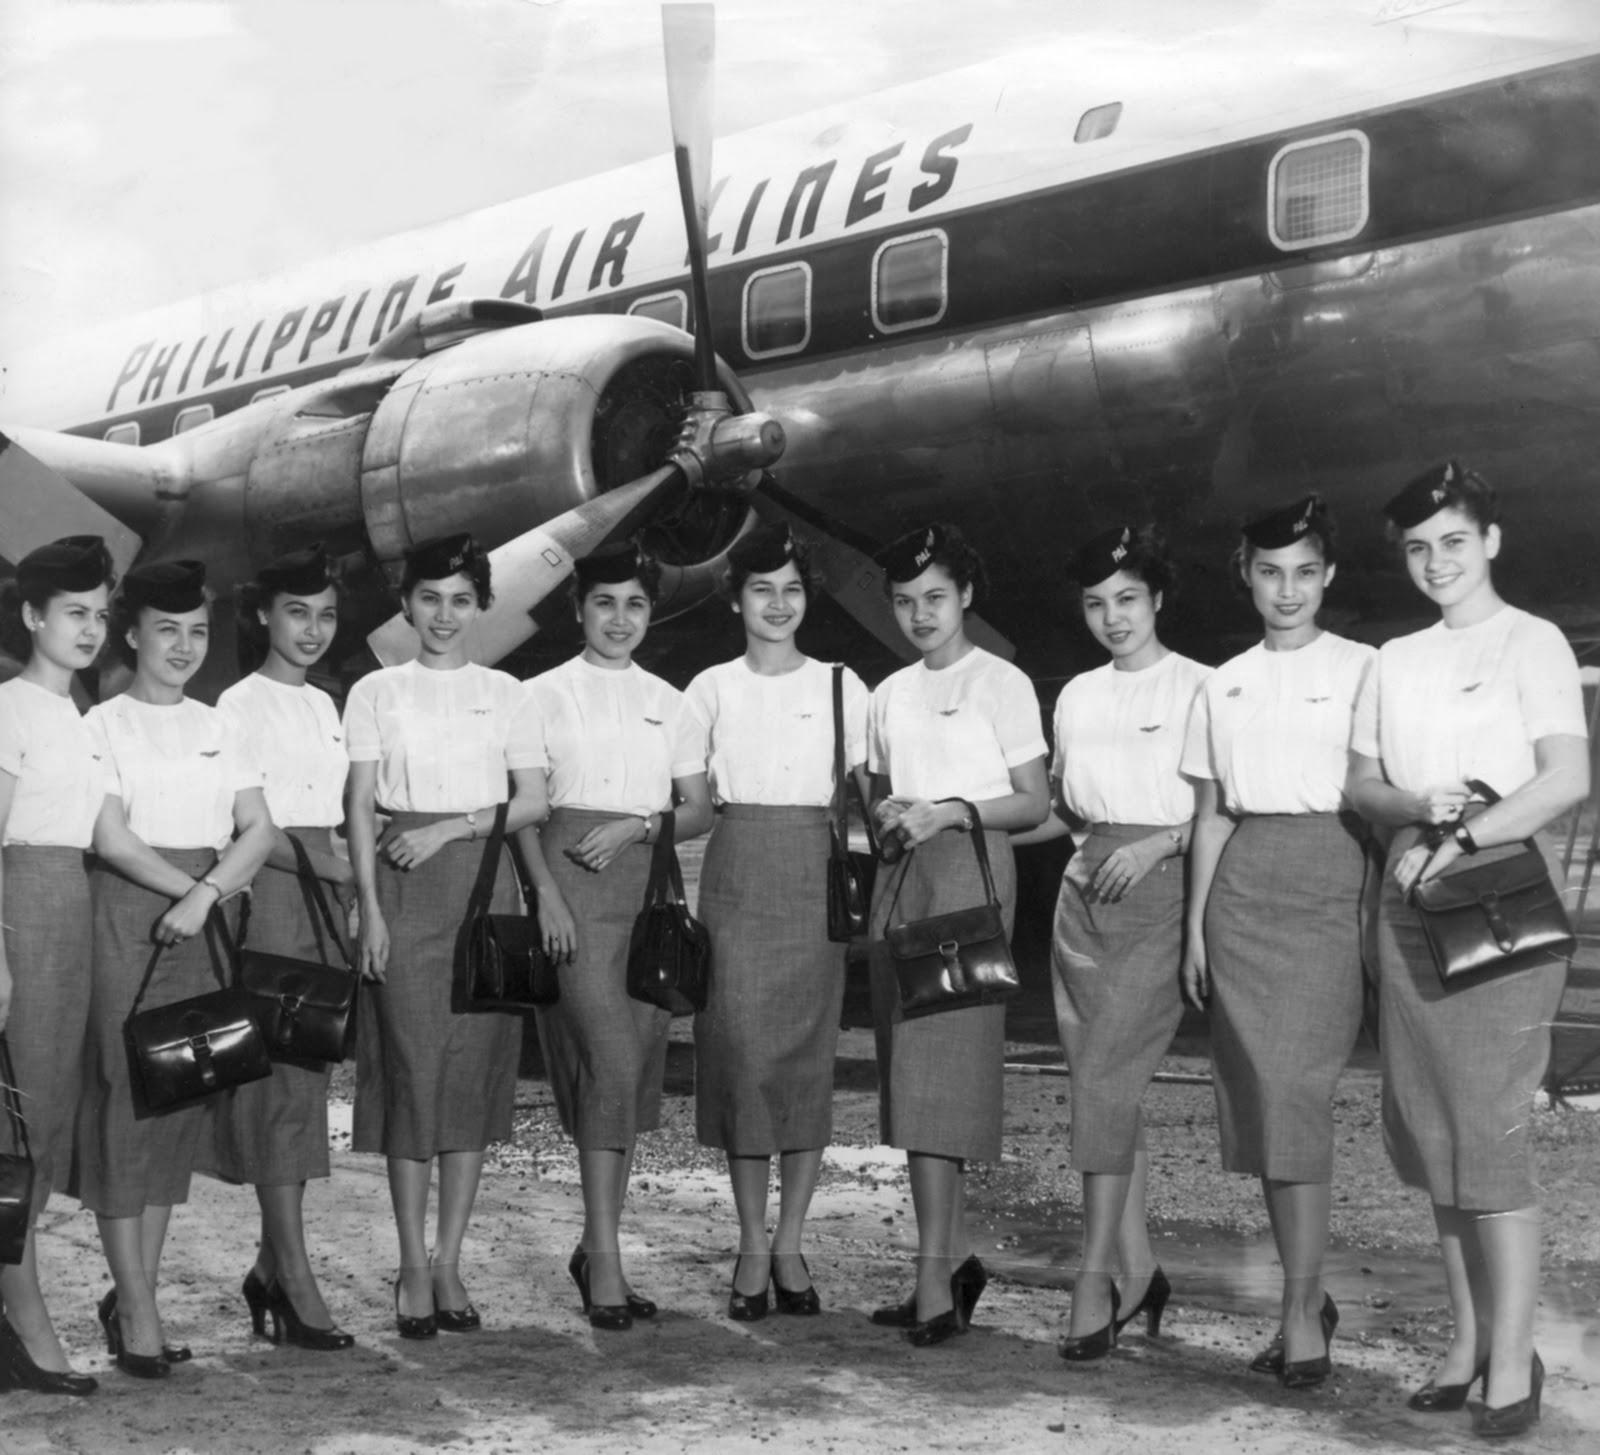 How do I become a commercial airline pilot?